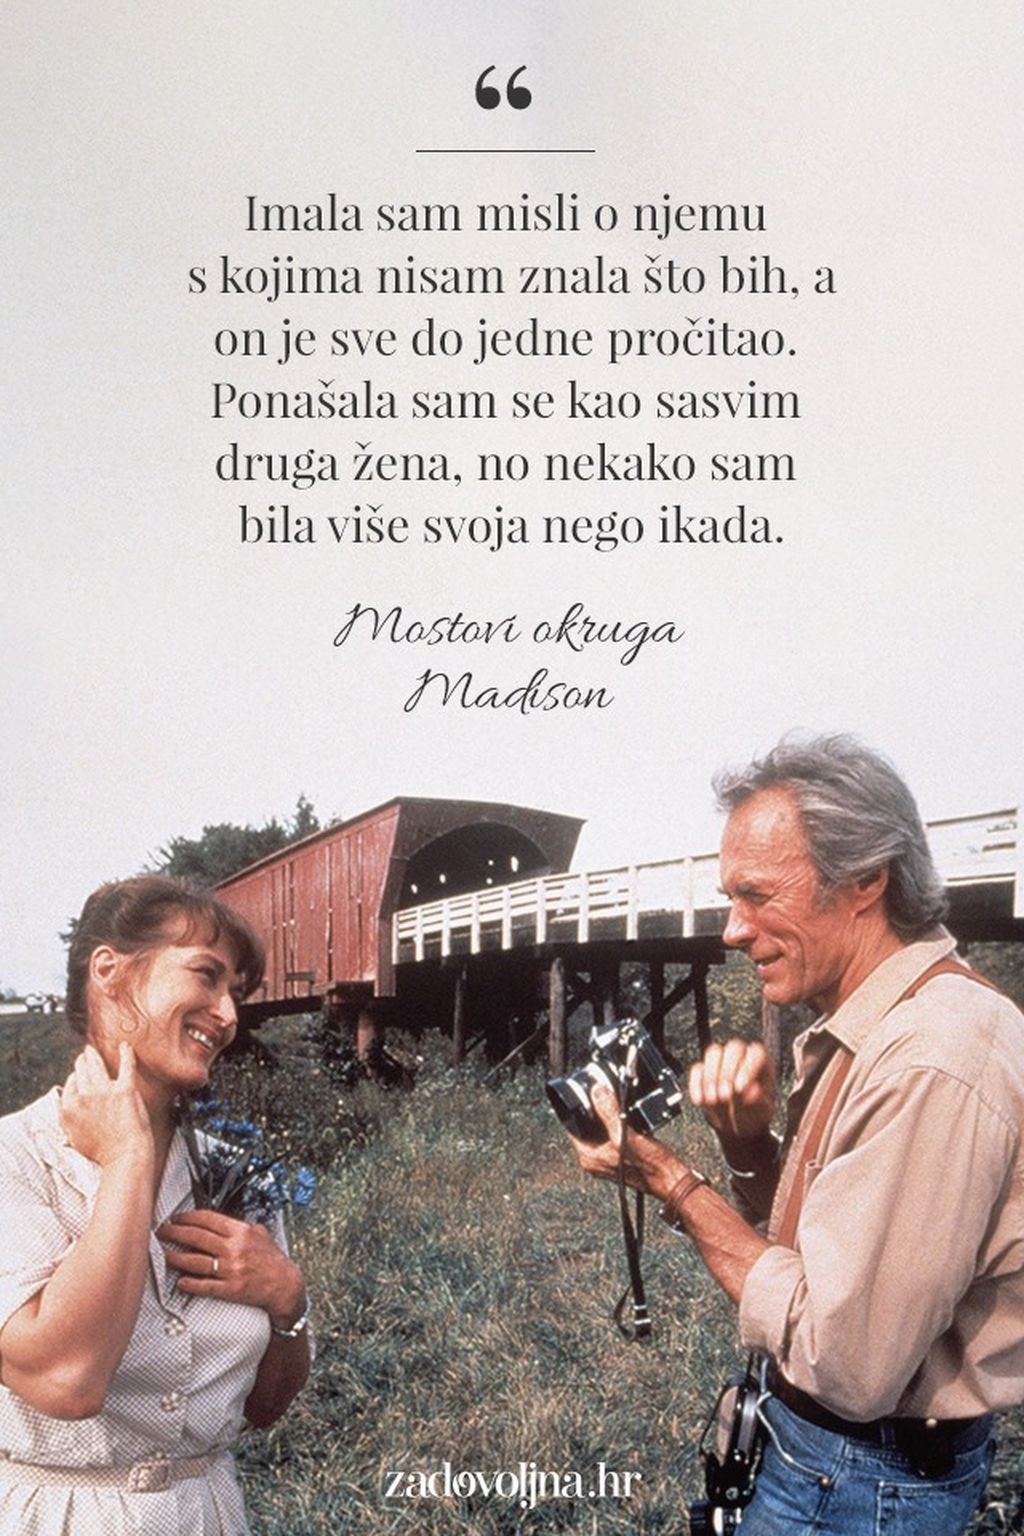 Citat iz filma \'Mostovi okruga Madison\'